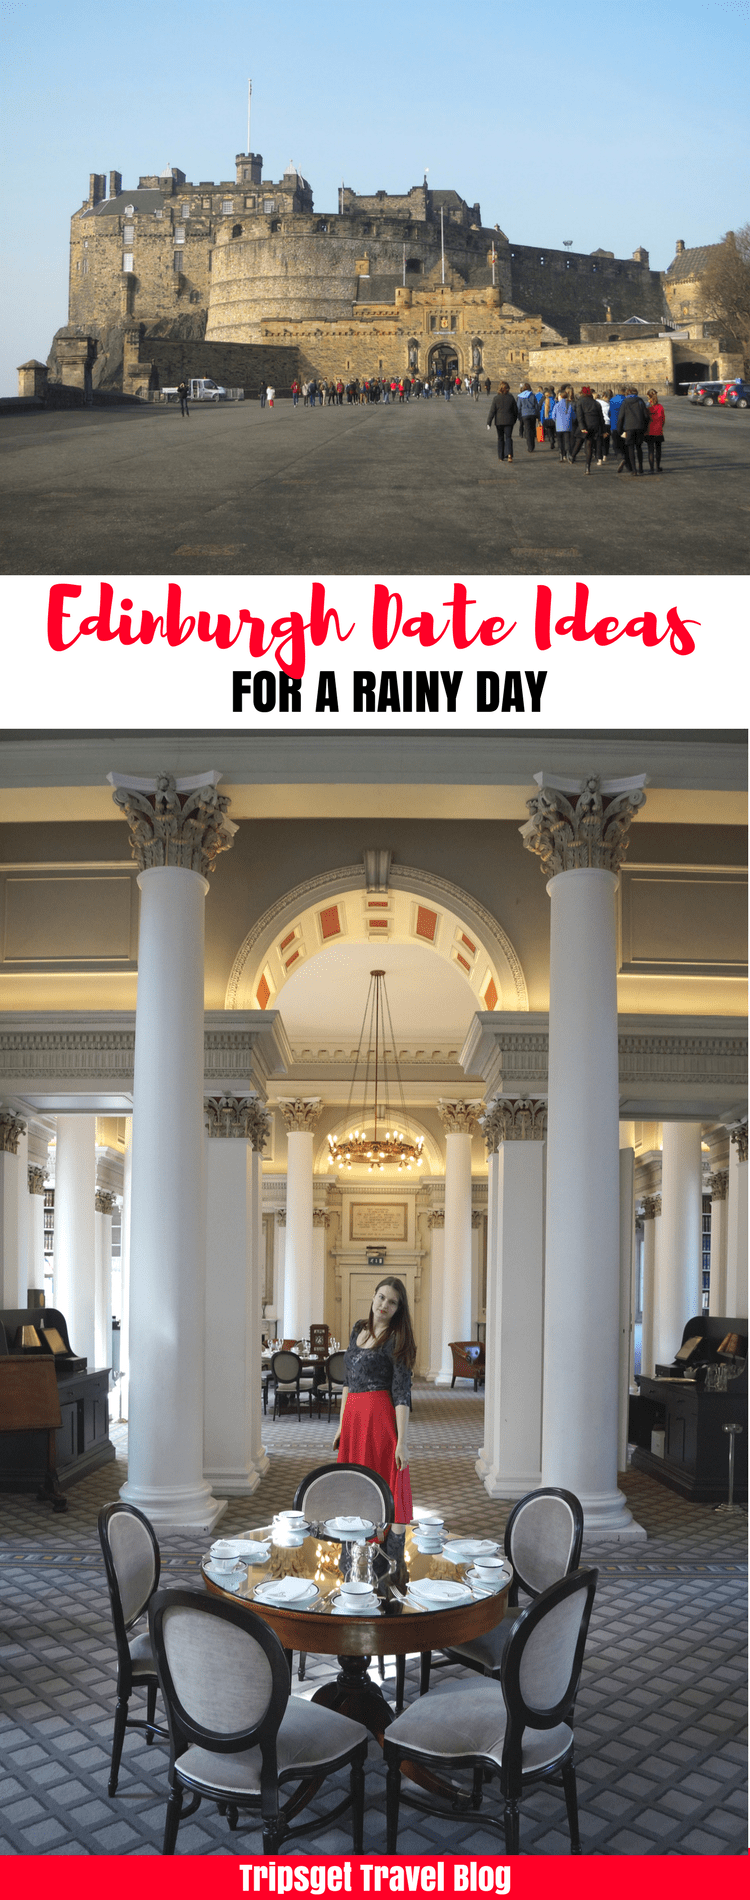 Date ideas in Edinburgh, Scotland for a rainy day - afternoon tea, high tea, cream tea, lunch, museum